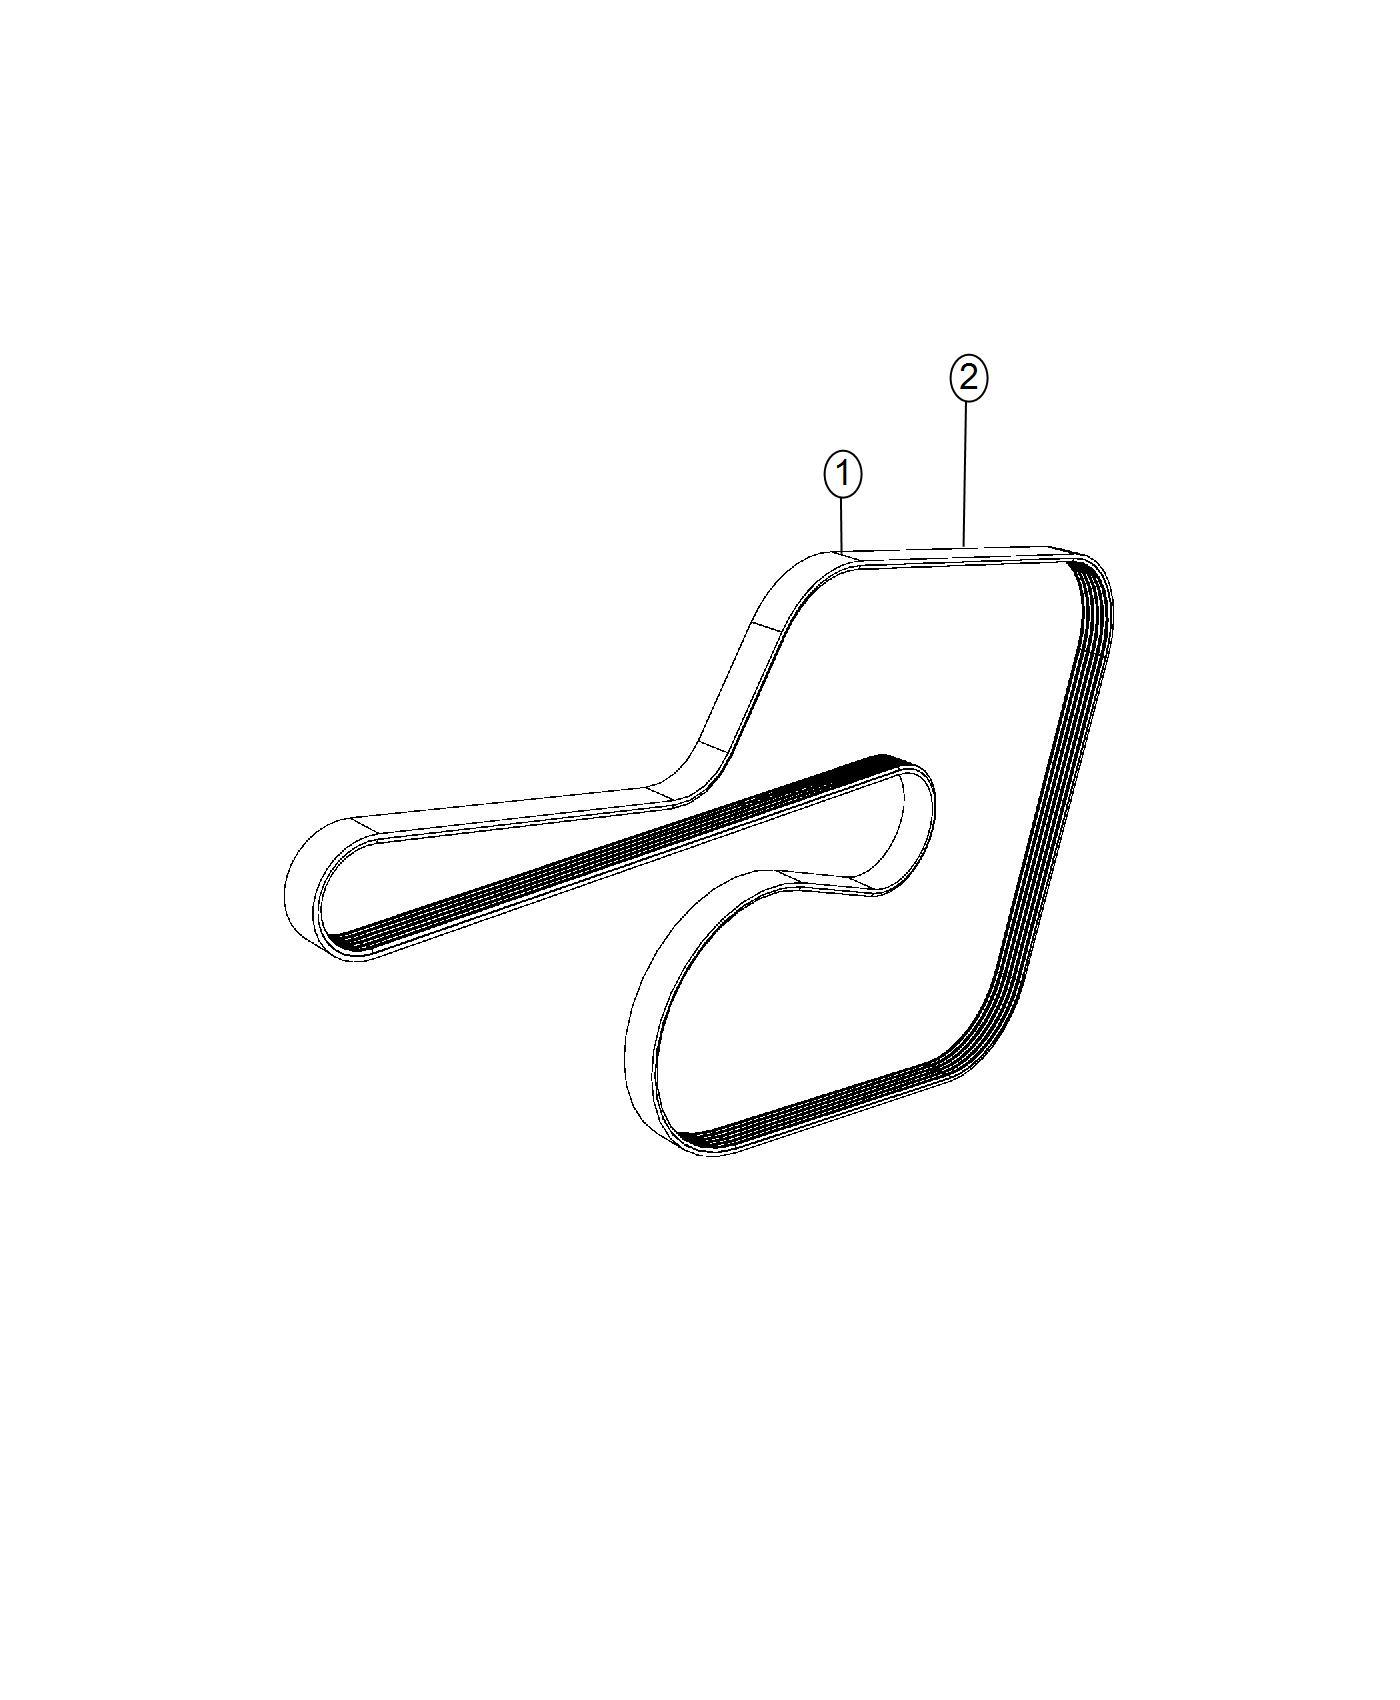 Dodge Charger Belt  Serpentine  Belts  Maintenance